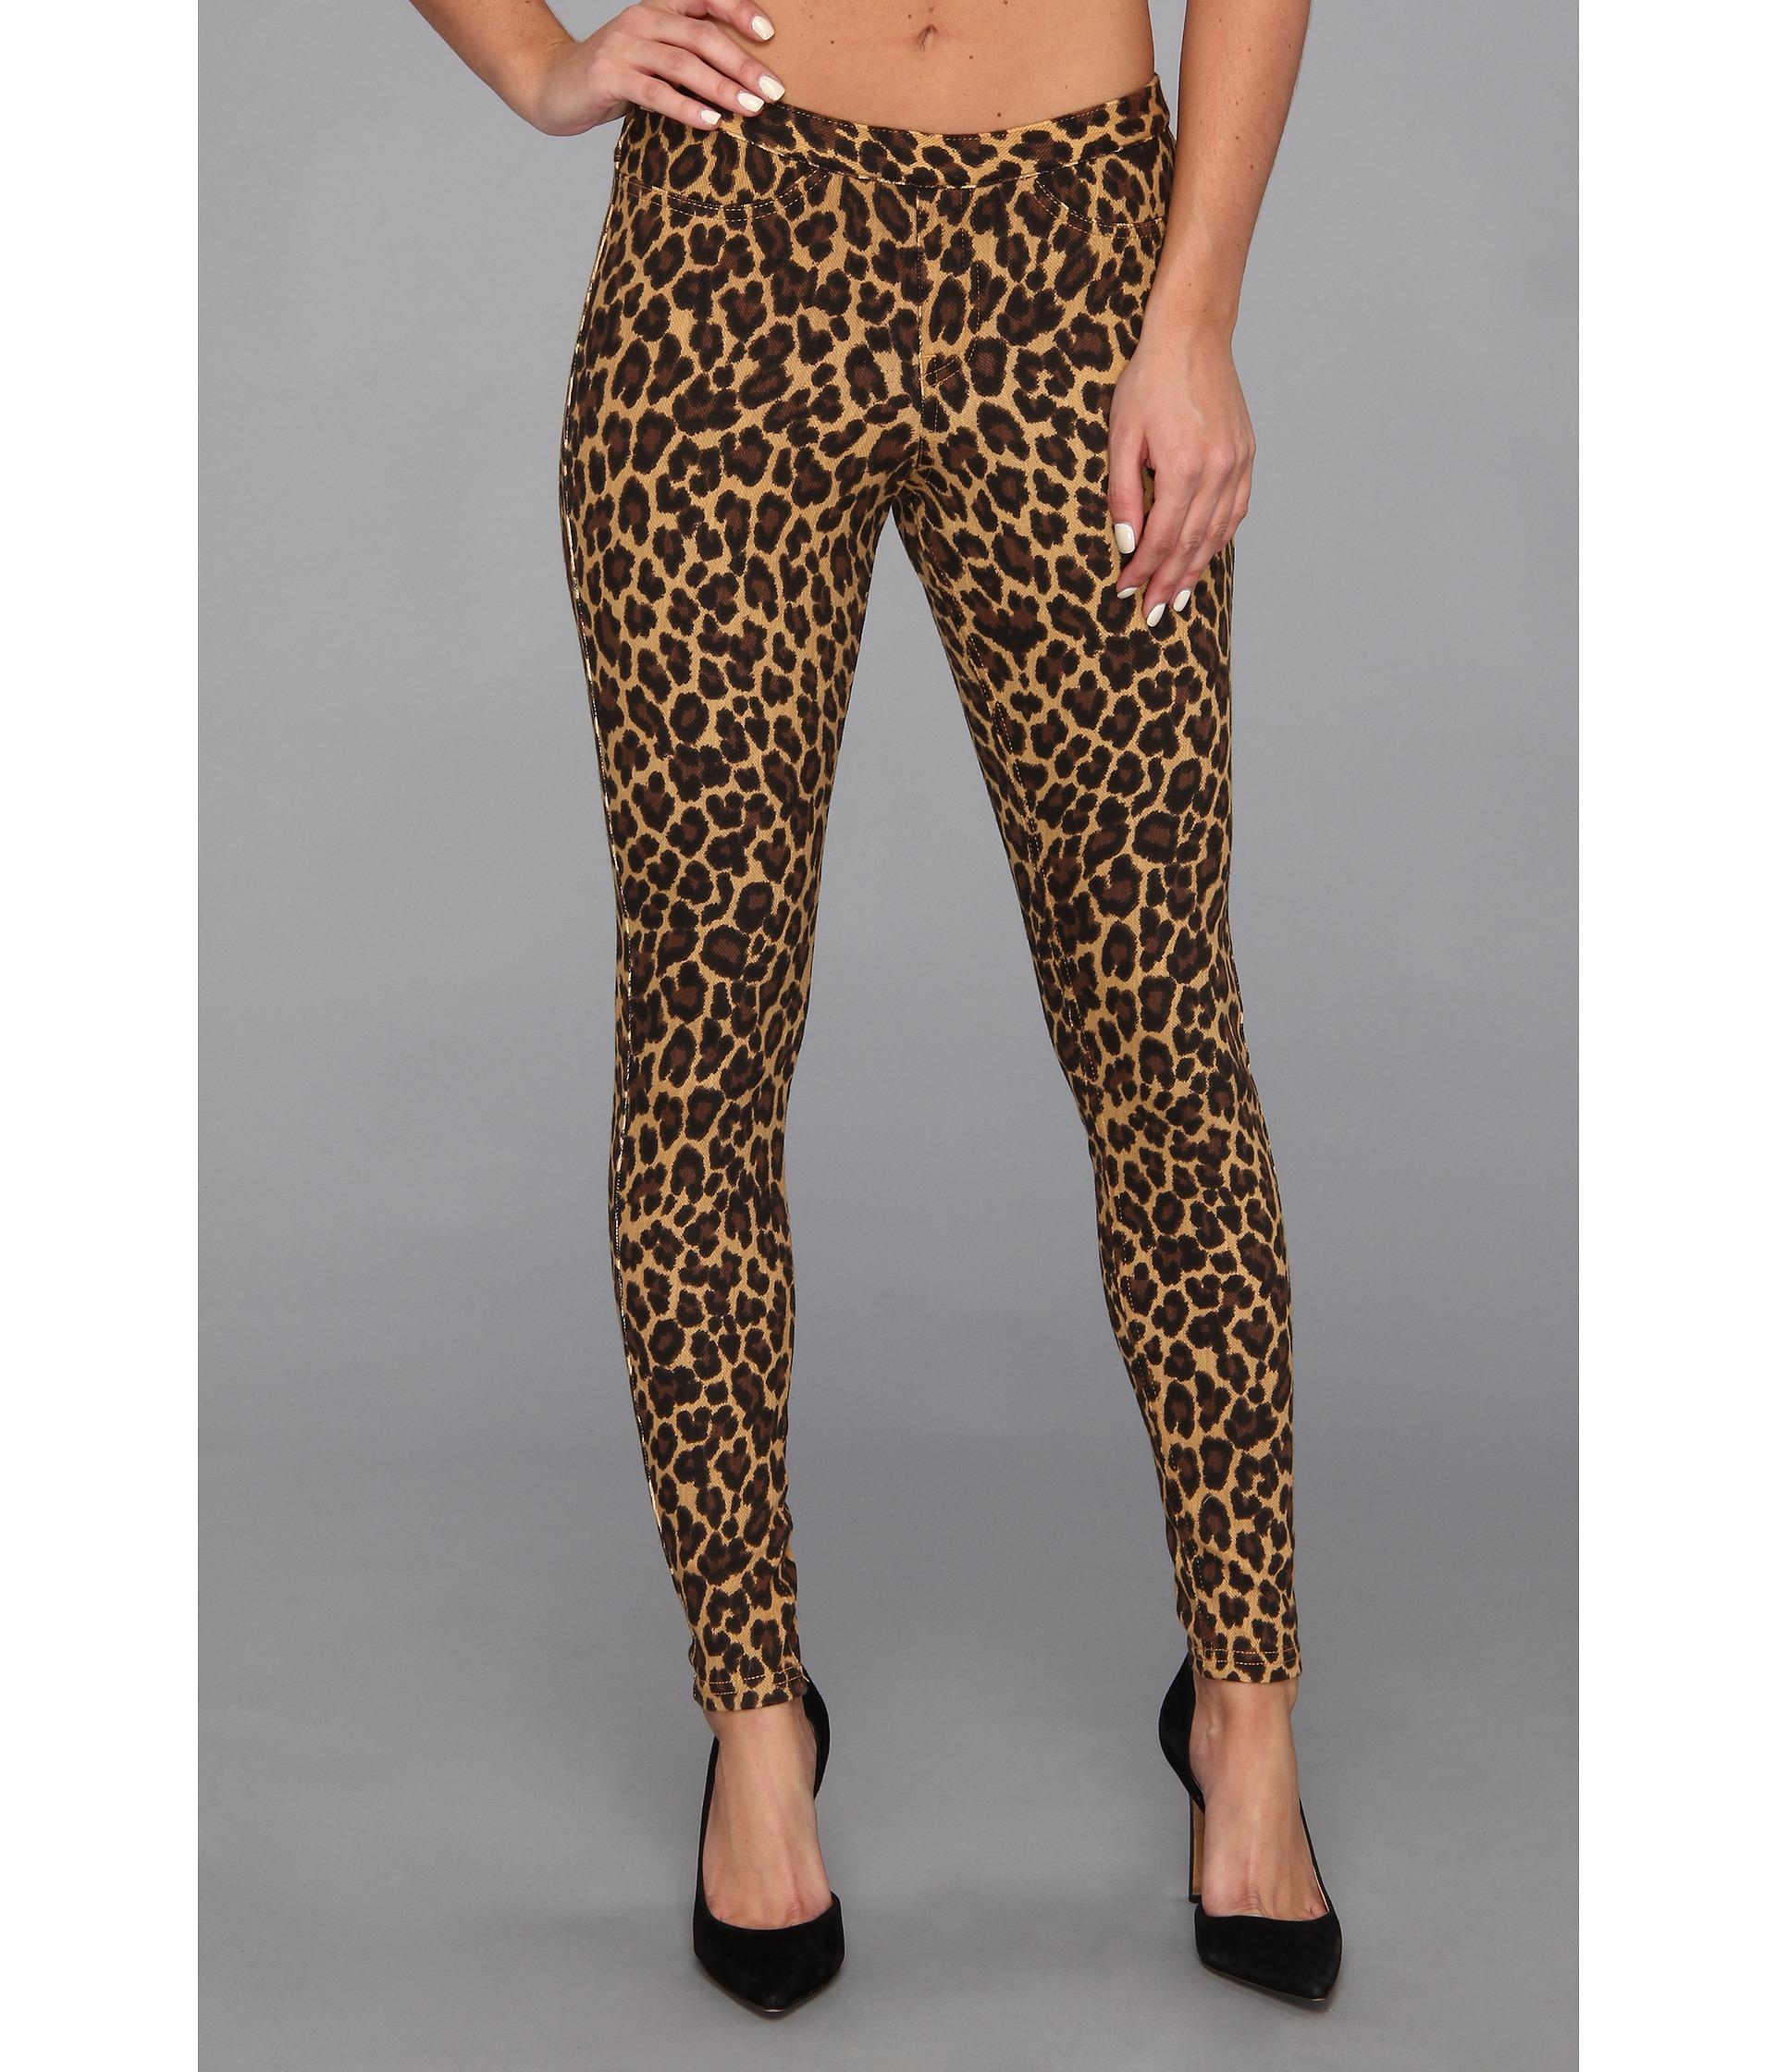 Hue Leopard Print Legging Shipped Free At Zappos